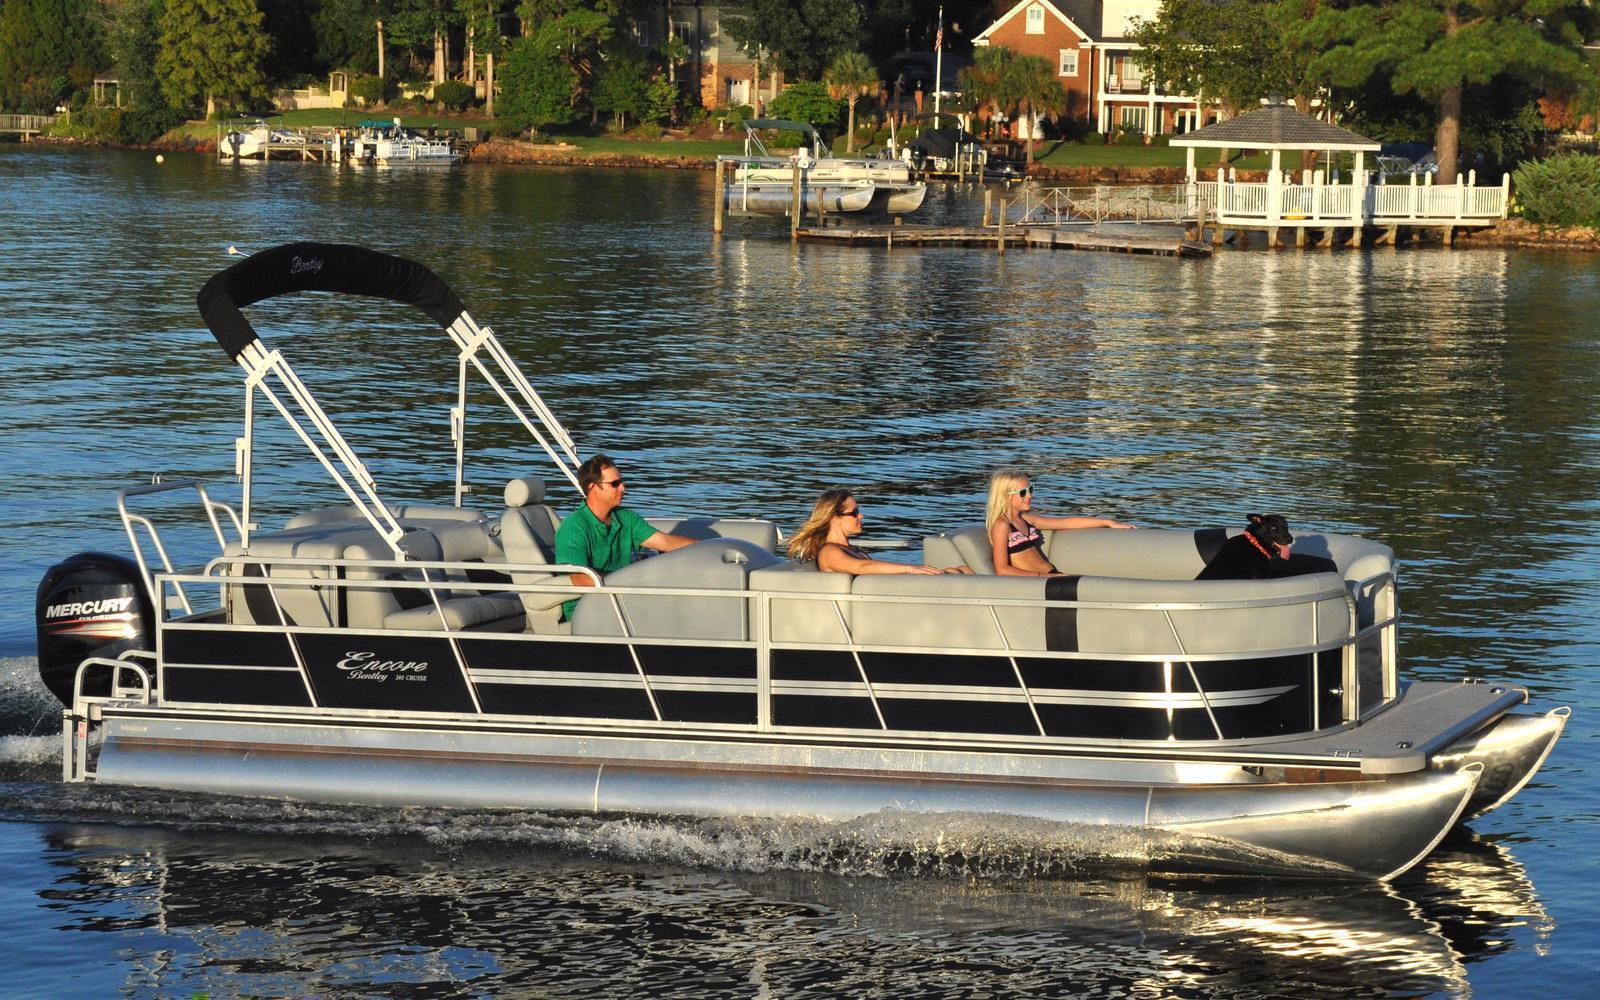 deck bentley magazine pontoon begin boat season the dealers let like